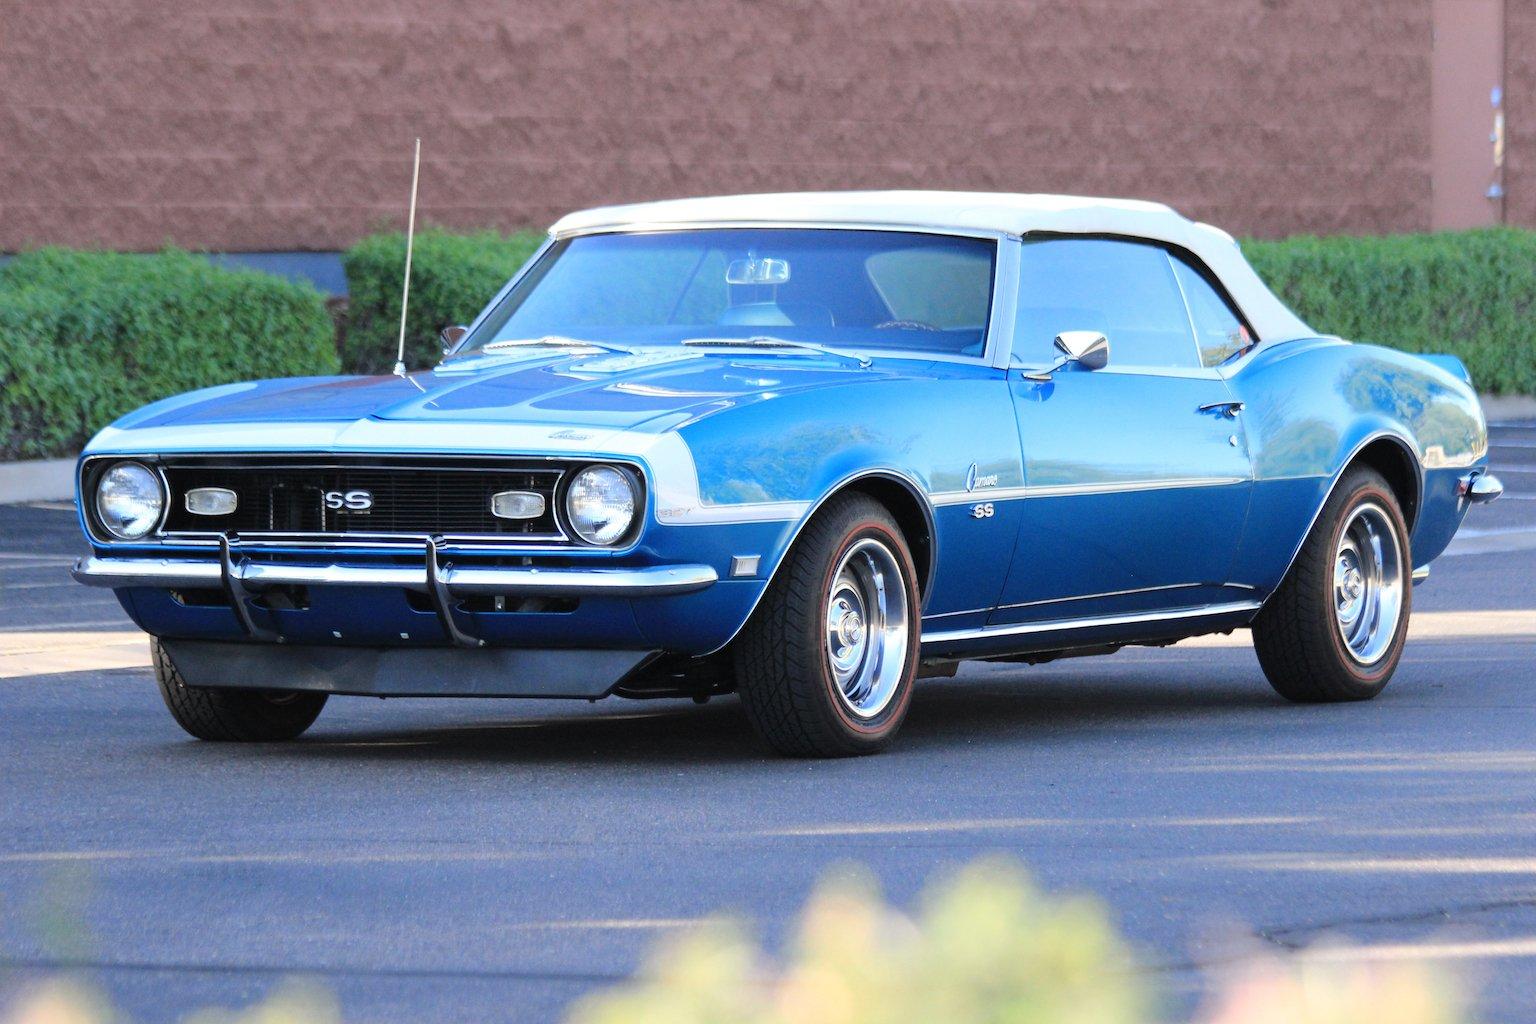 1968 Chevrolet Camaro Classic Collectible Vehicle Storage Blue